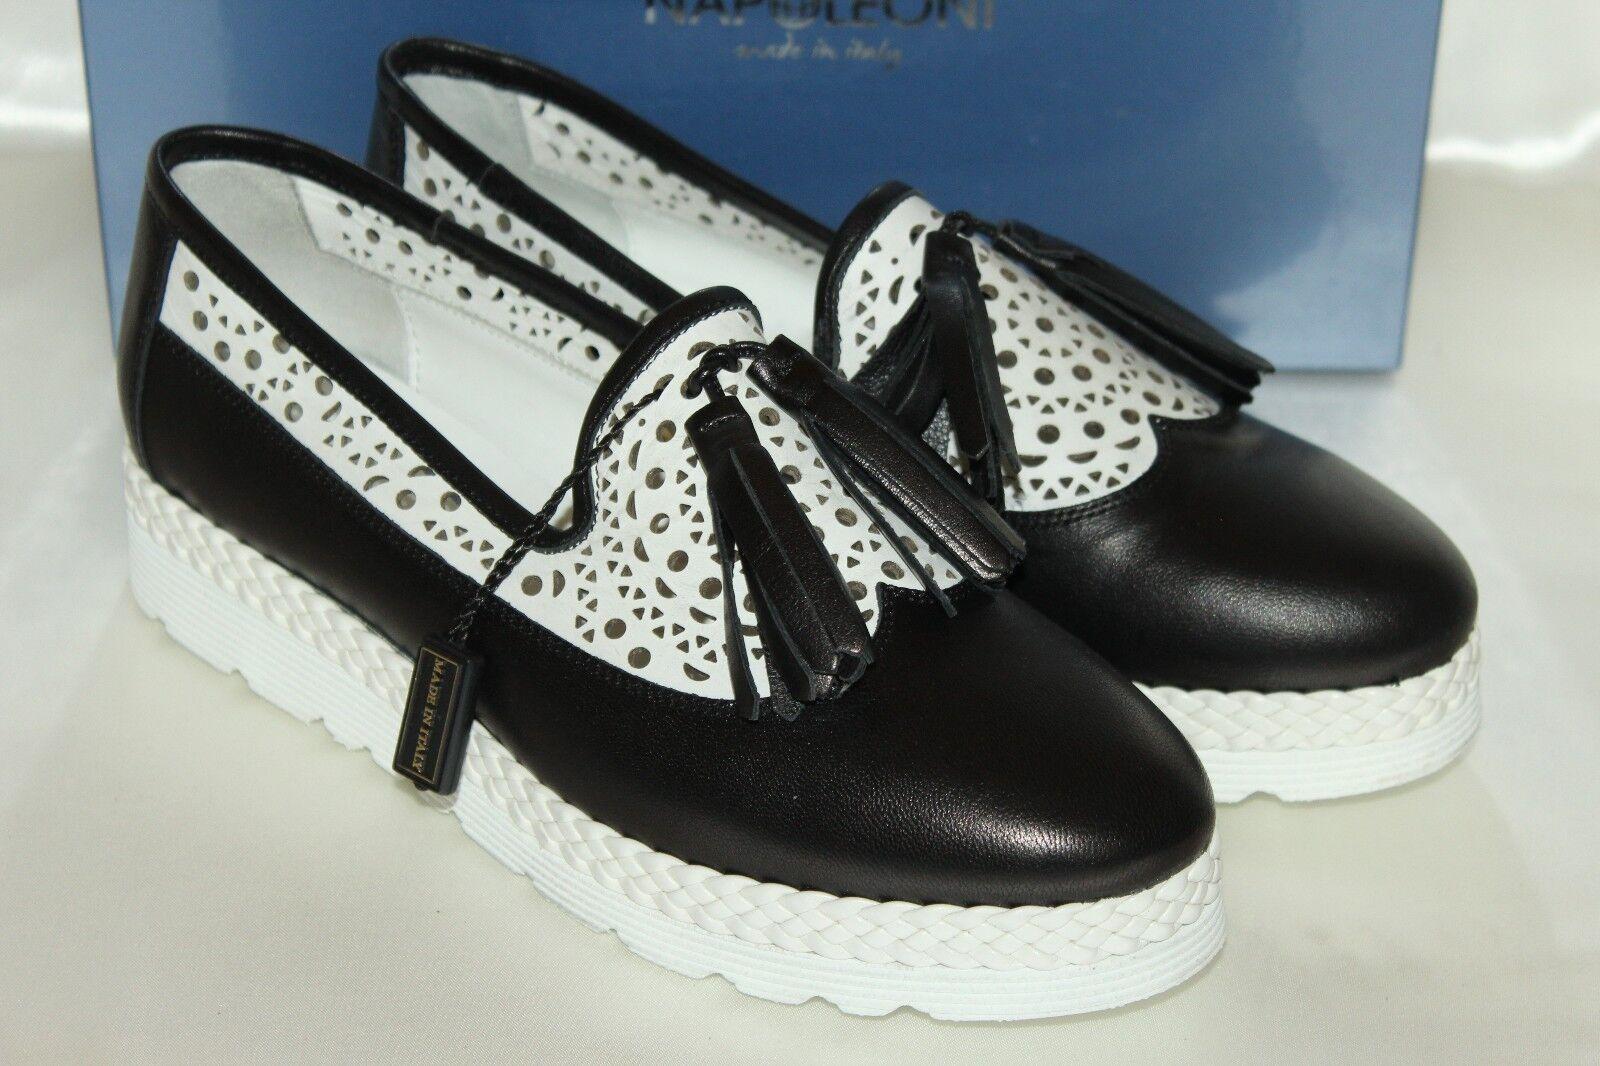 NEW NIB NAPOLEONI Black White Italian Leather Tassel Platform Loafers EU38 ITALY